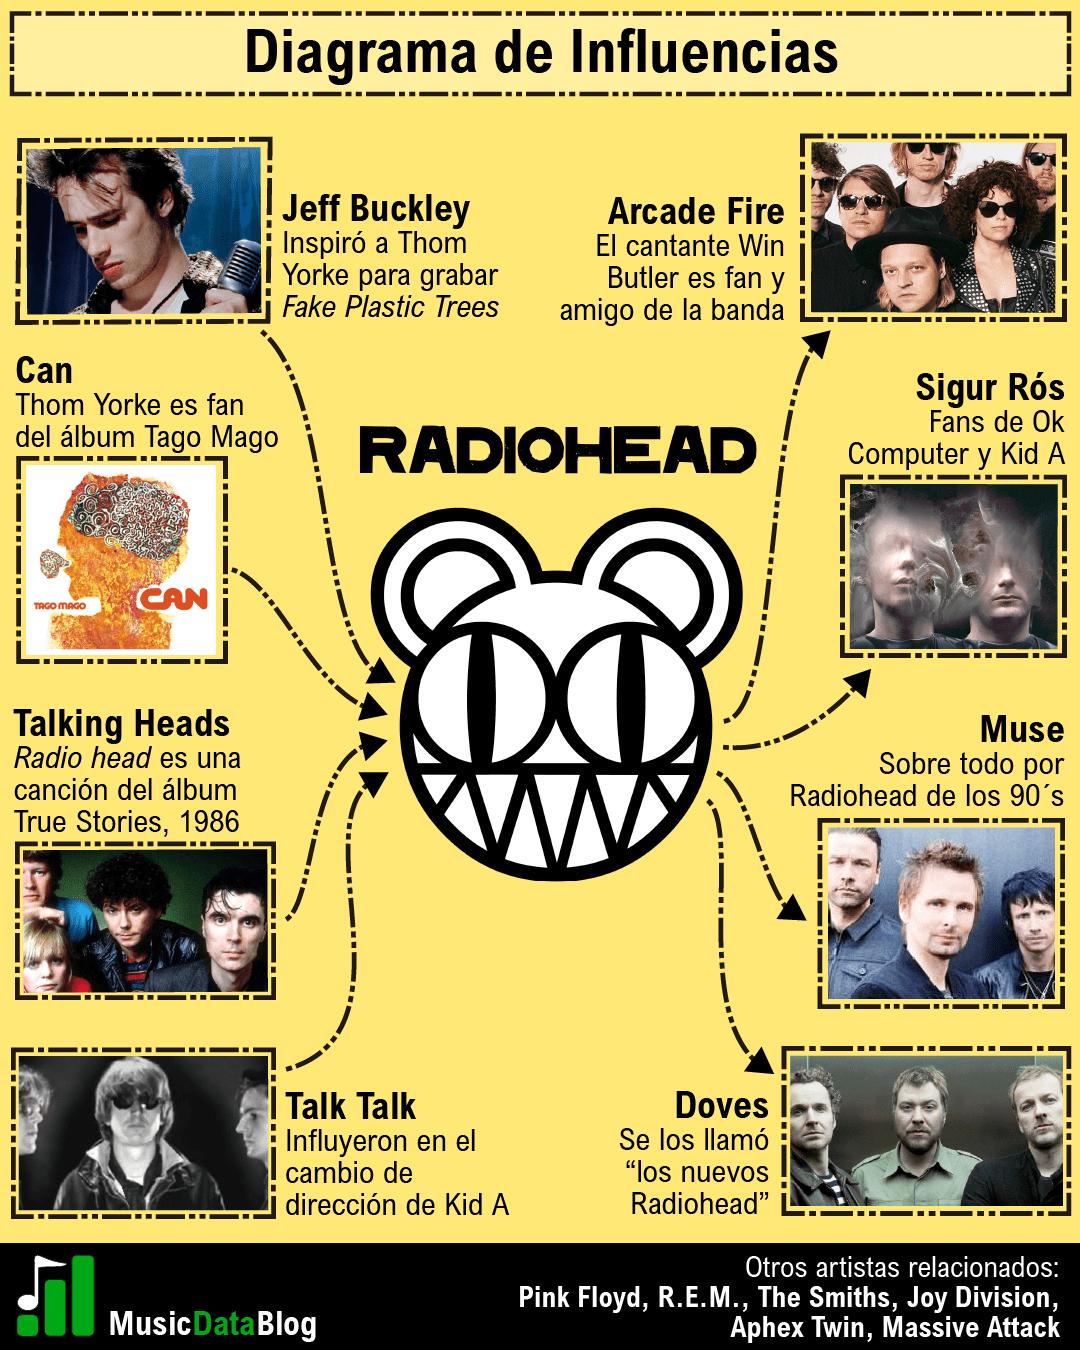 radiohead influencias infografia